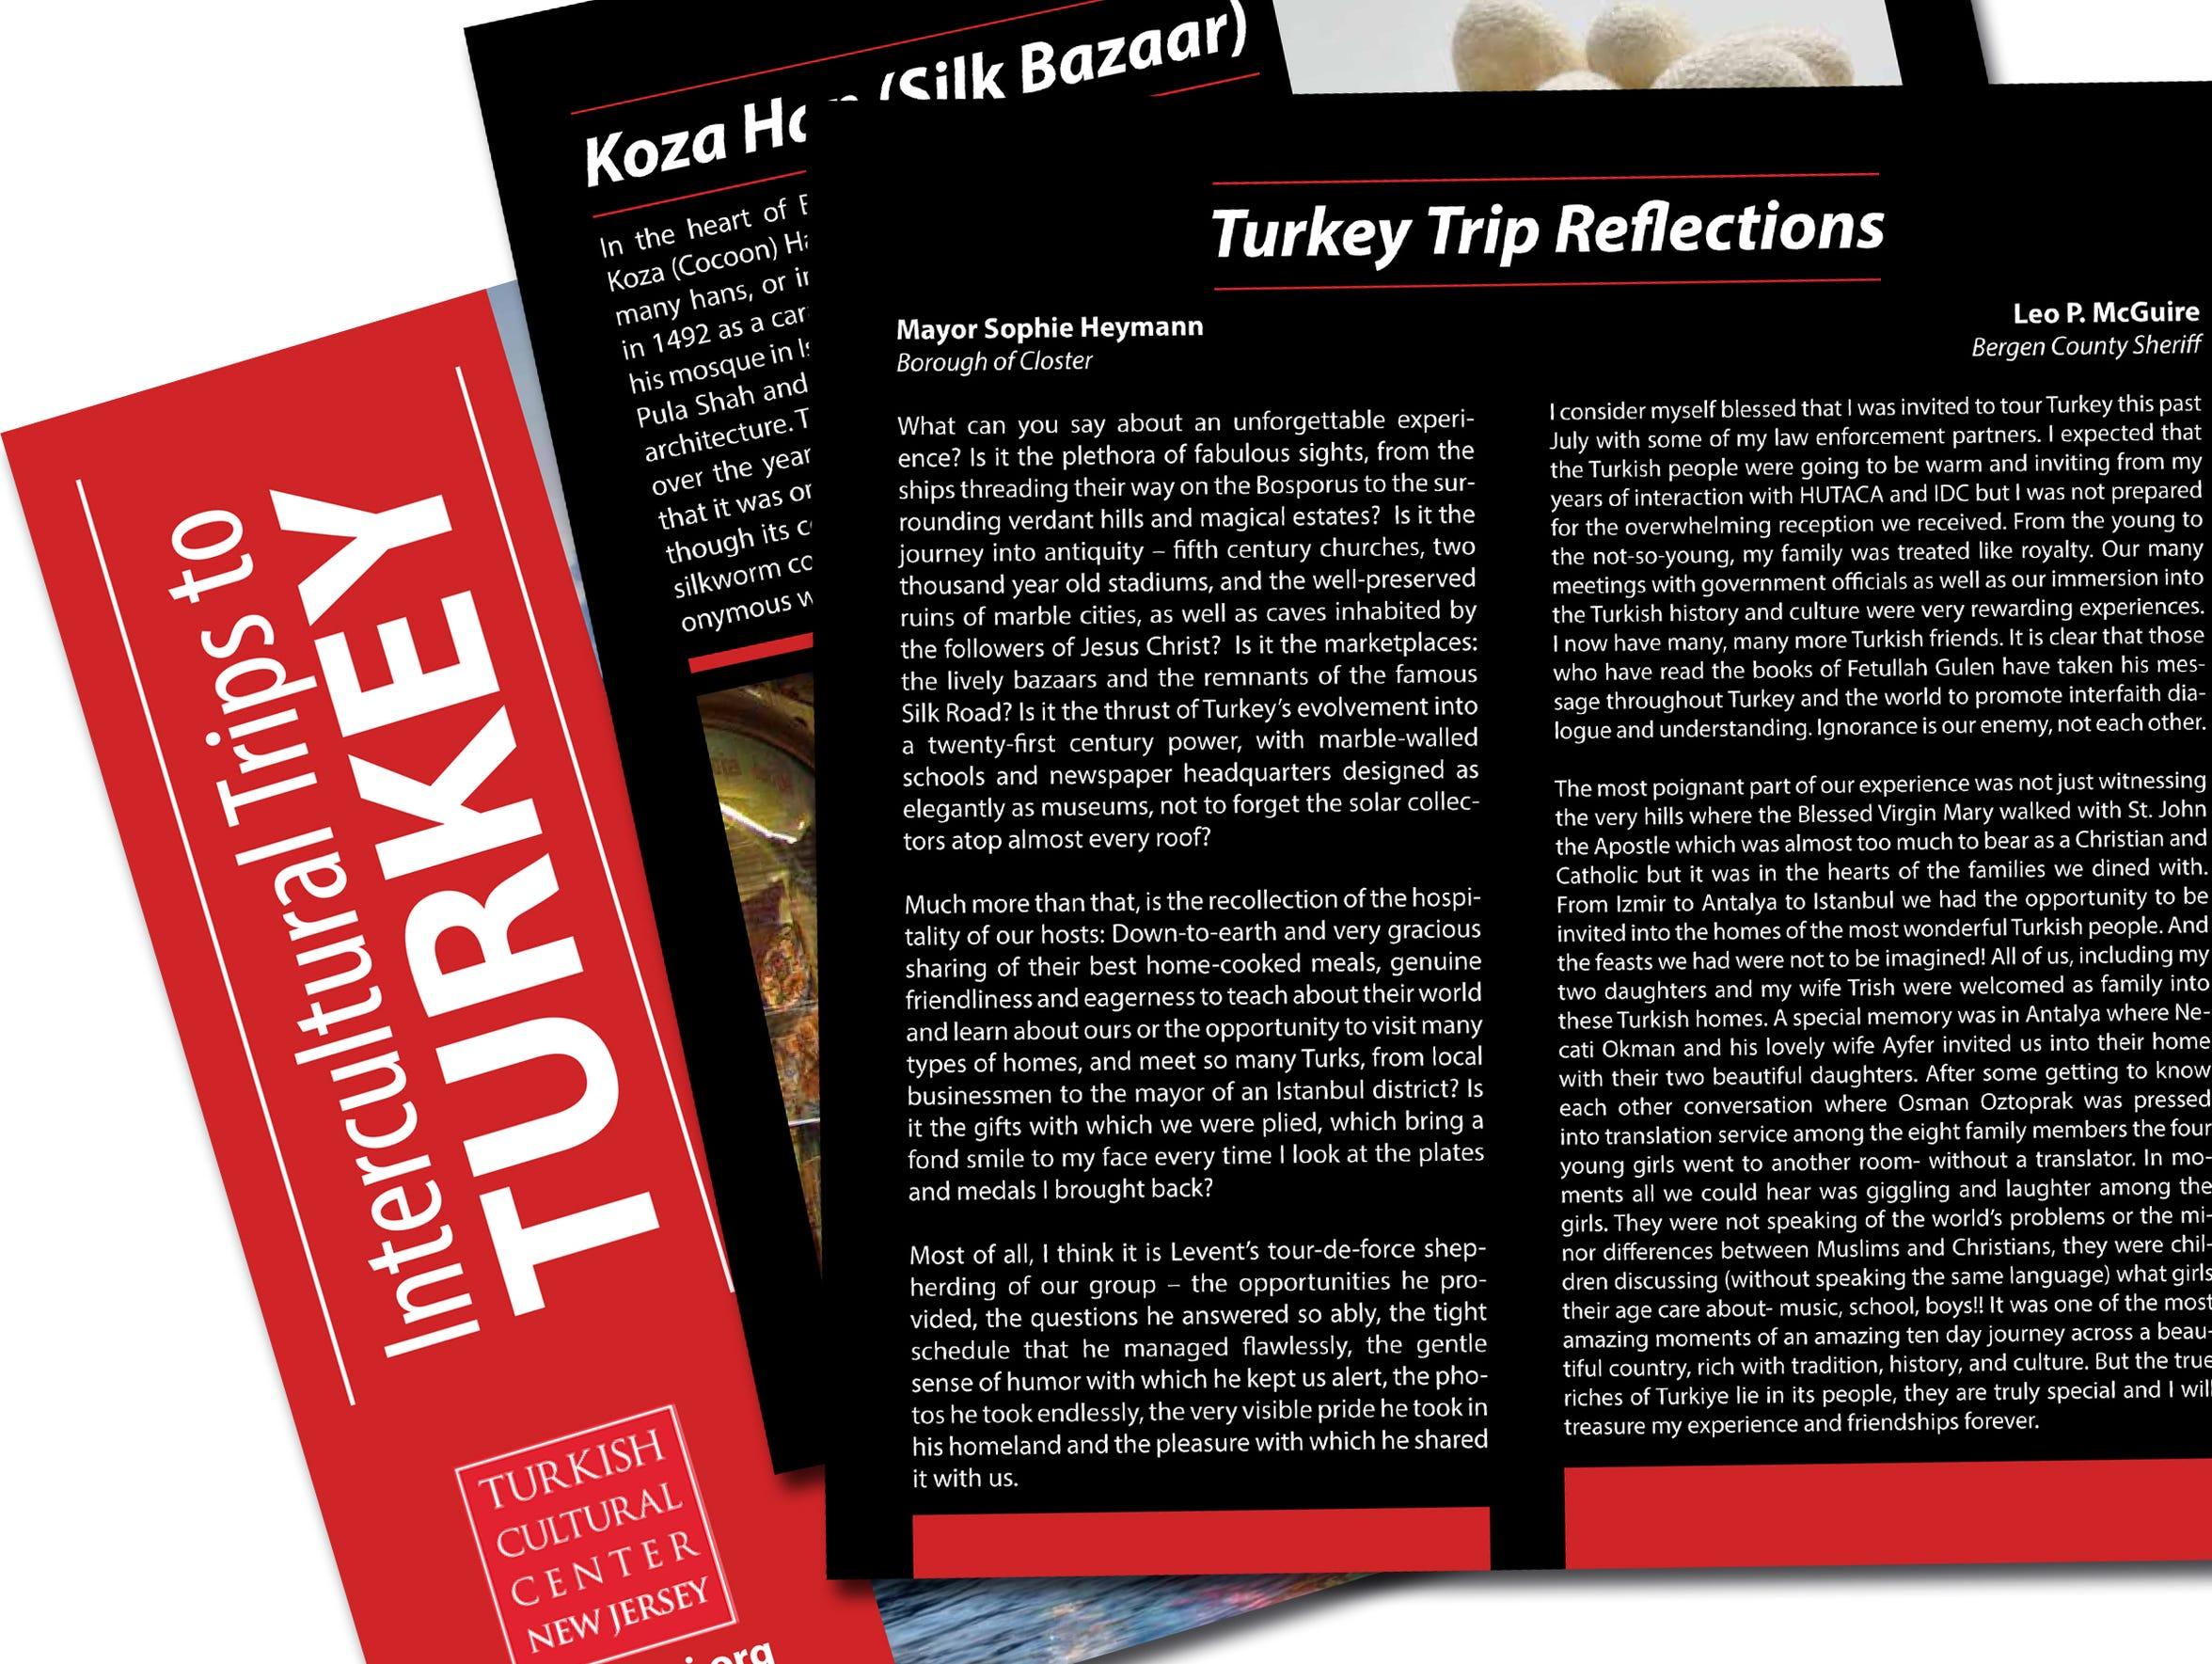 Leo P. McGuire's reflections in Turkey trip brochure